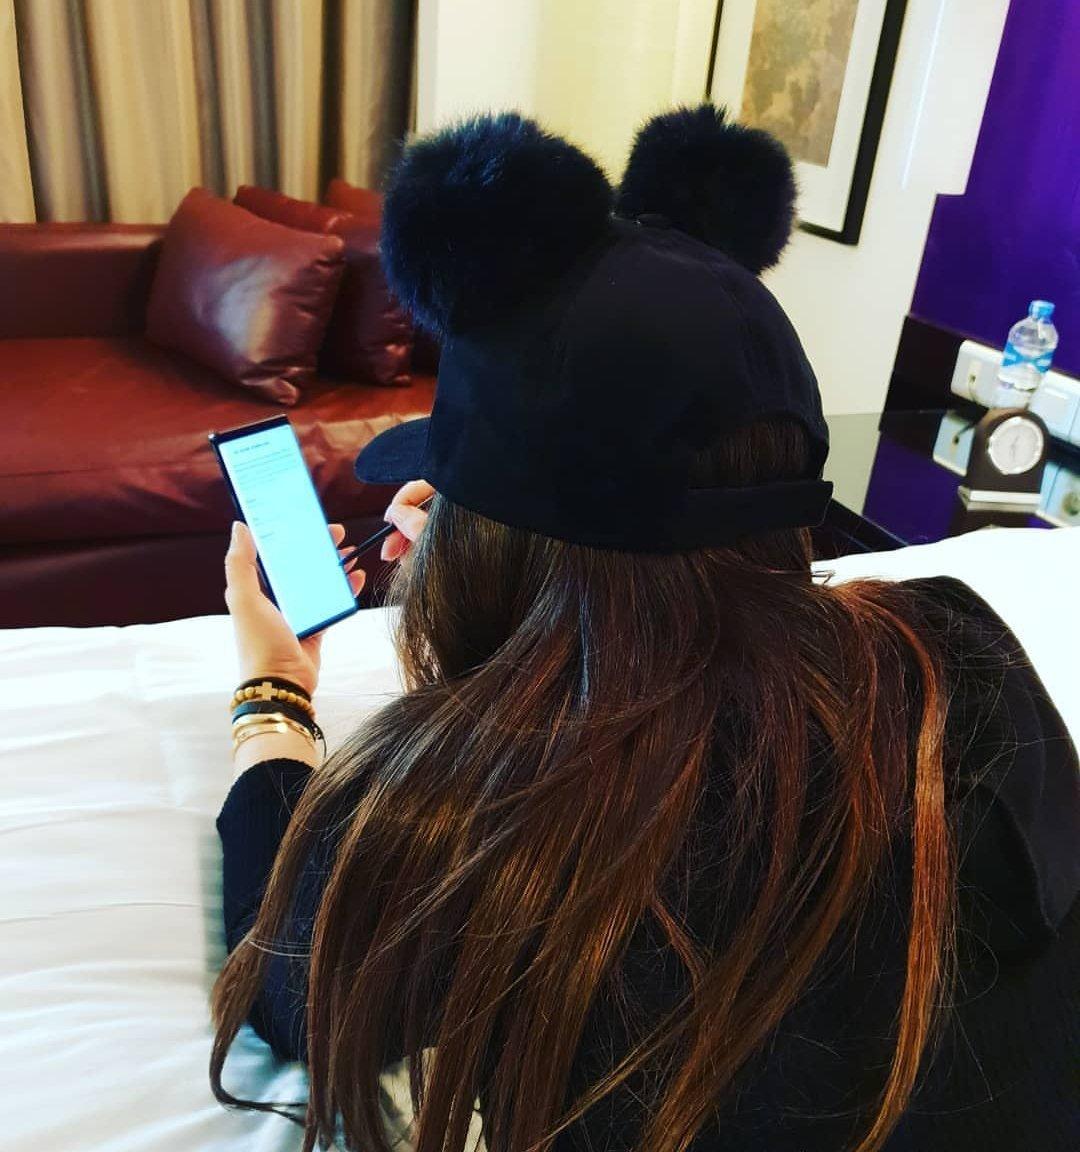 RT @RamyLs: Elissa is enjoying her new #GalaxyNote9 #Samsung 😍 https://t.co/mpFMfAyGJy